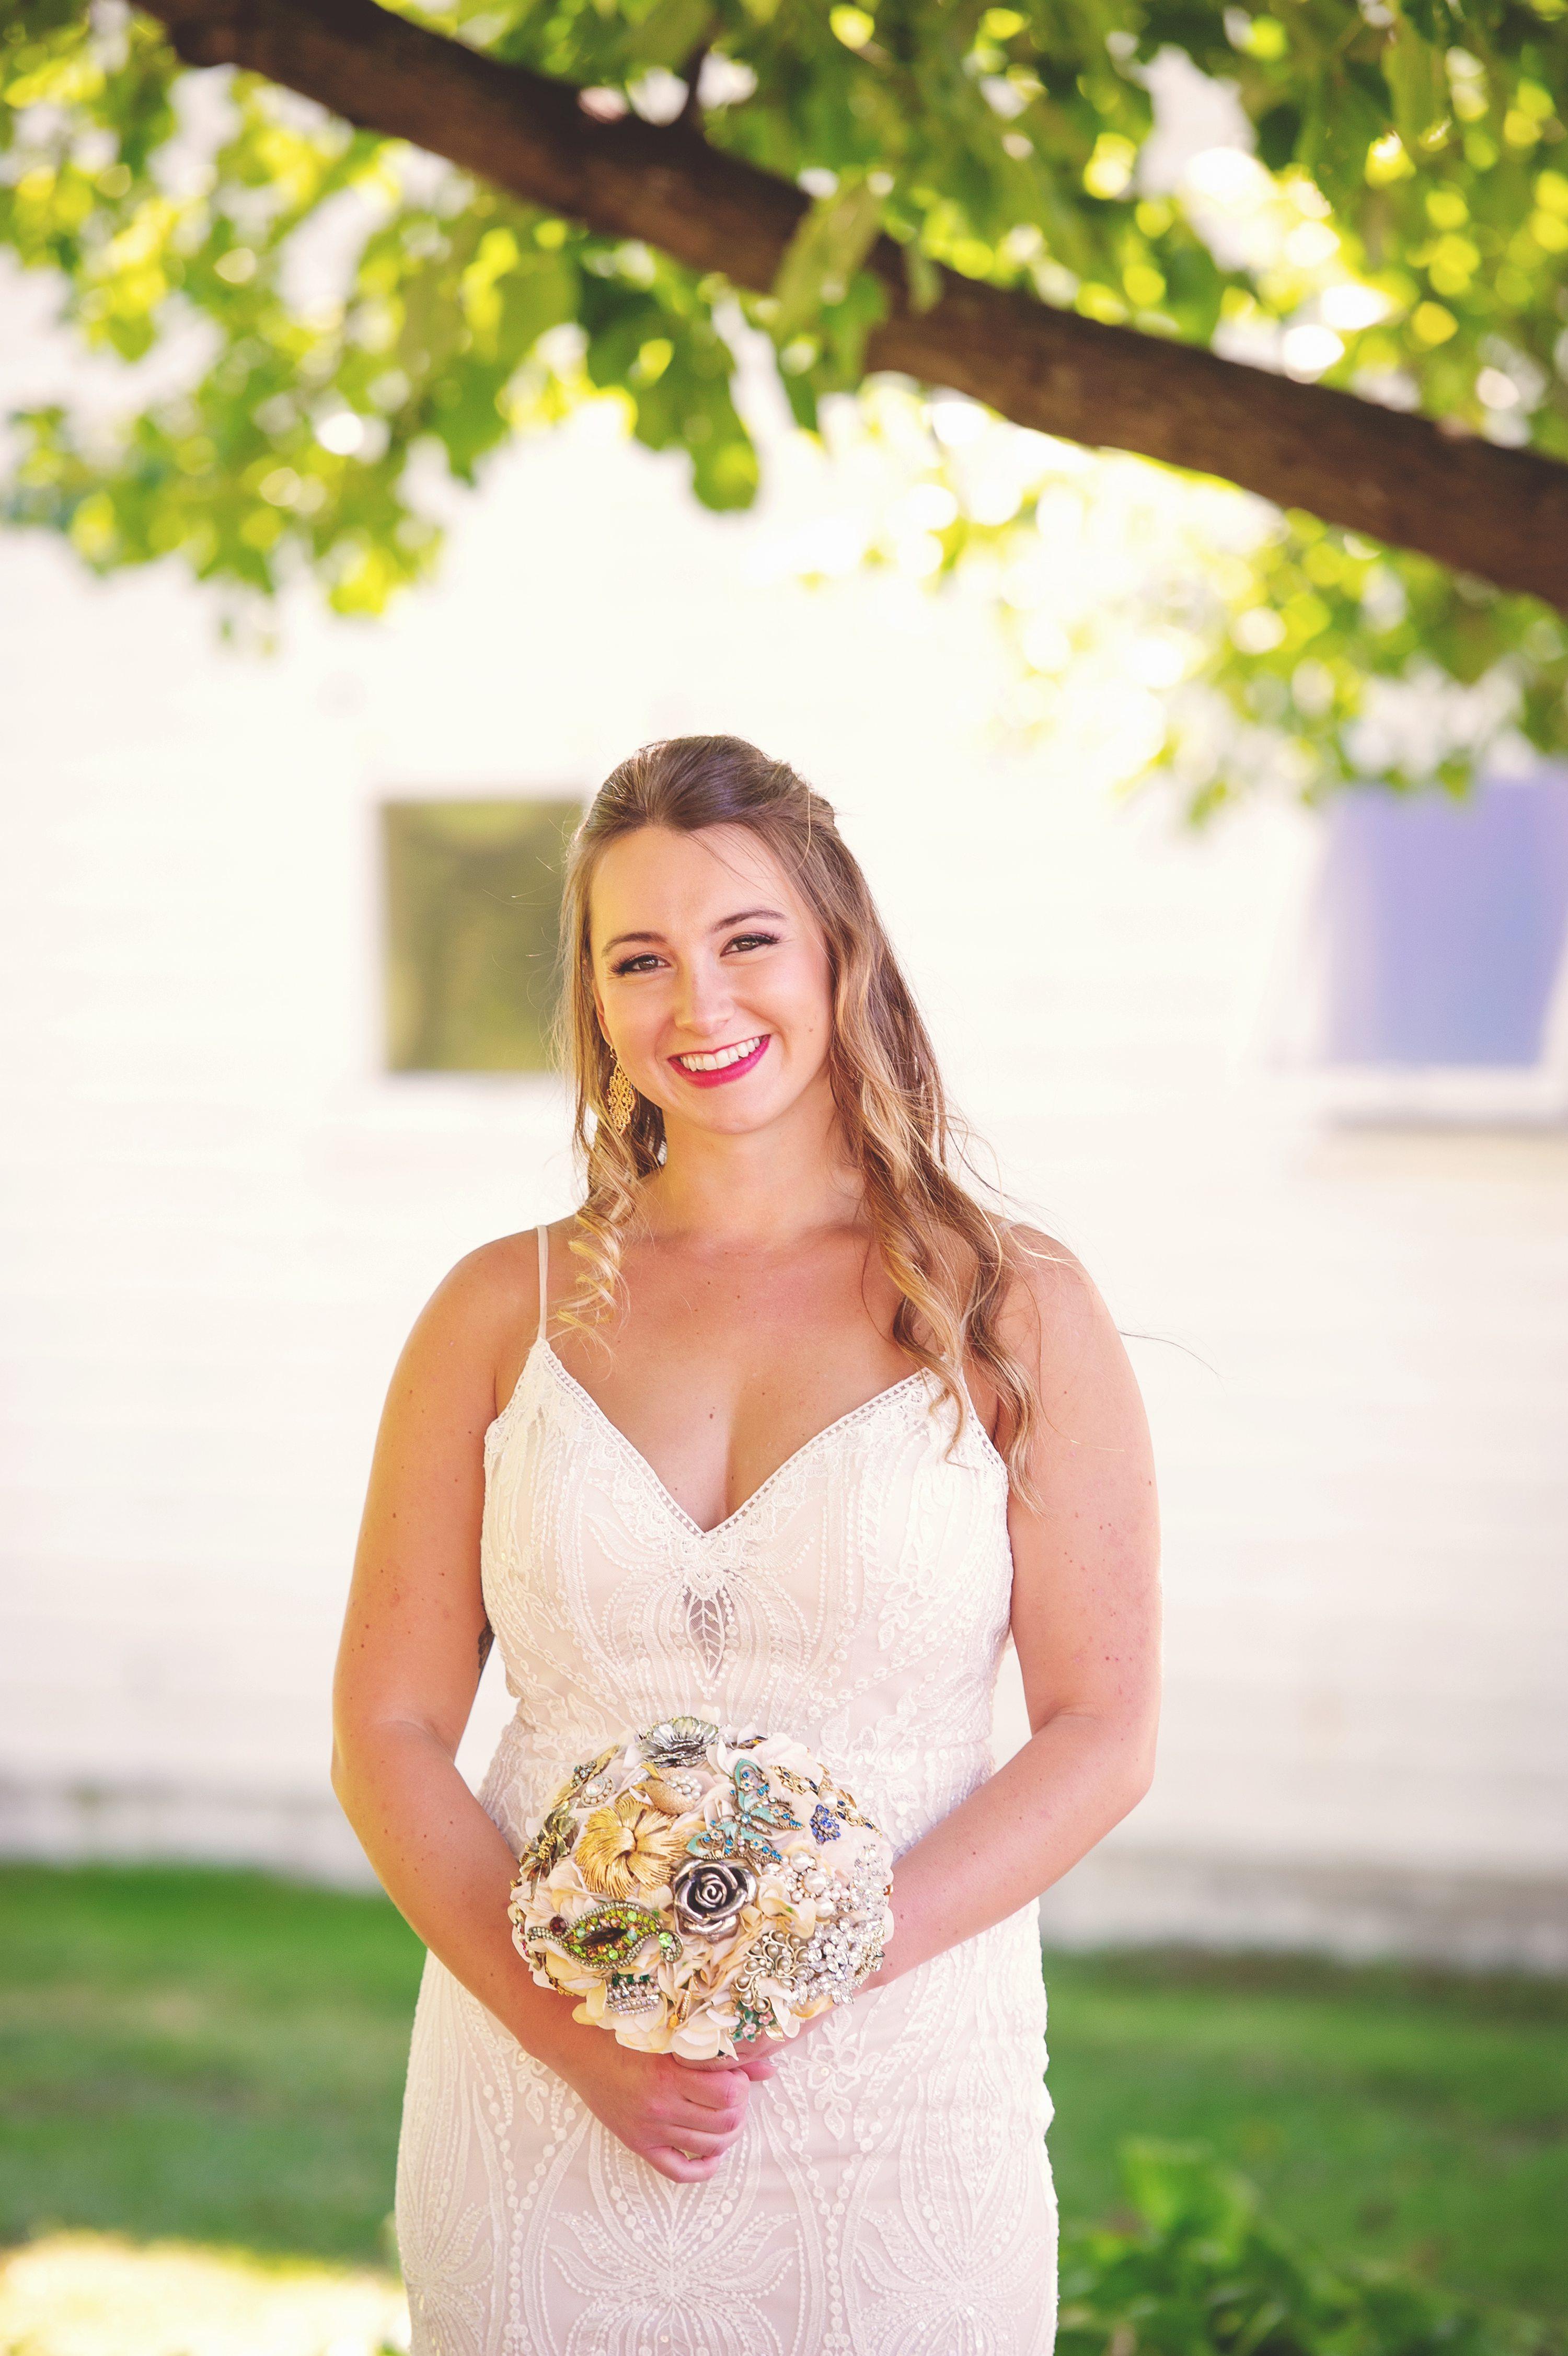 Villa Park Portrait Photographer, Danada Farm Wedding